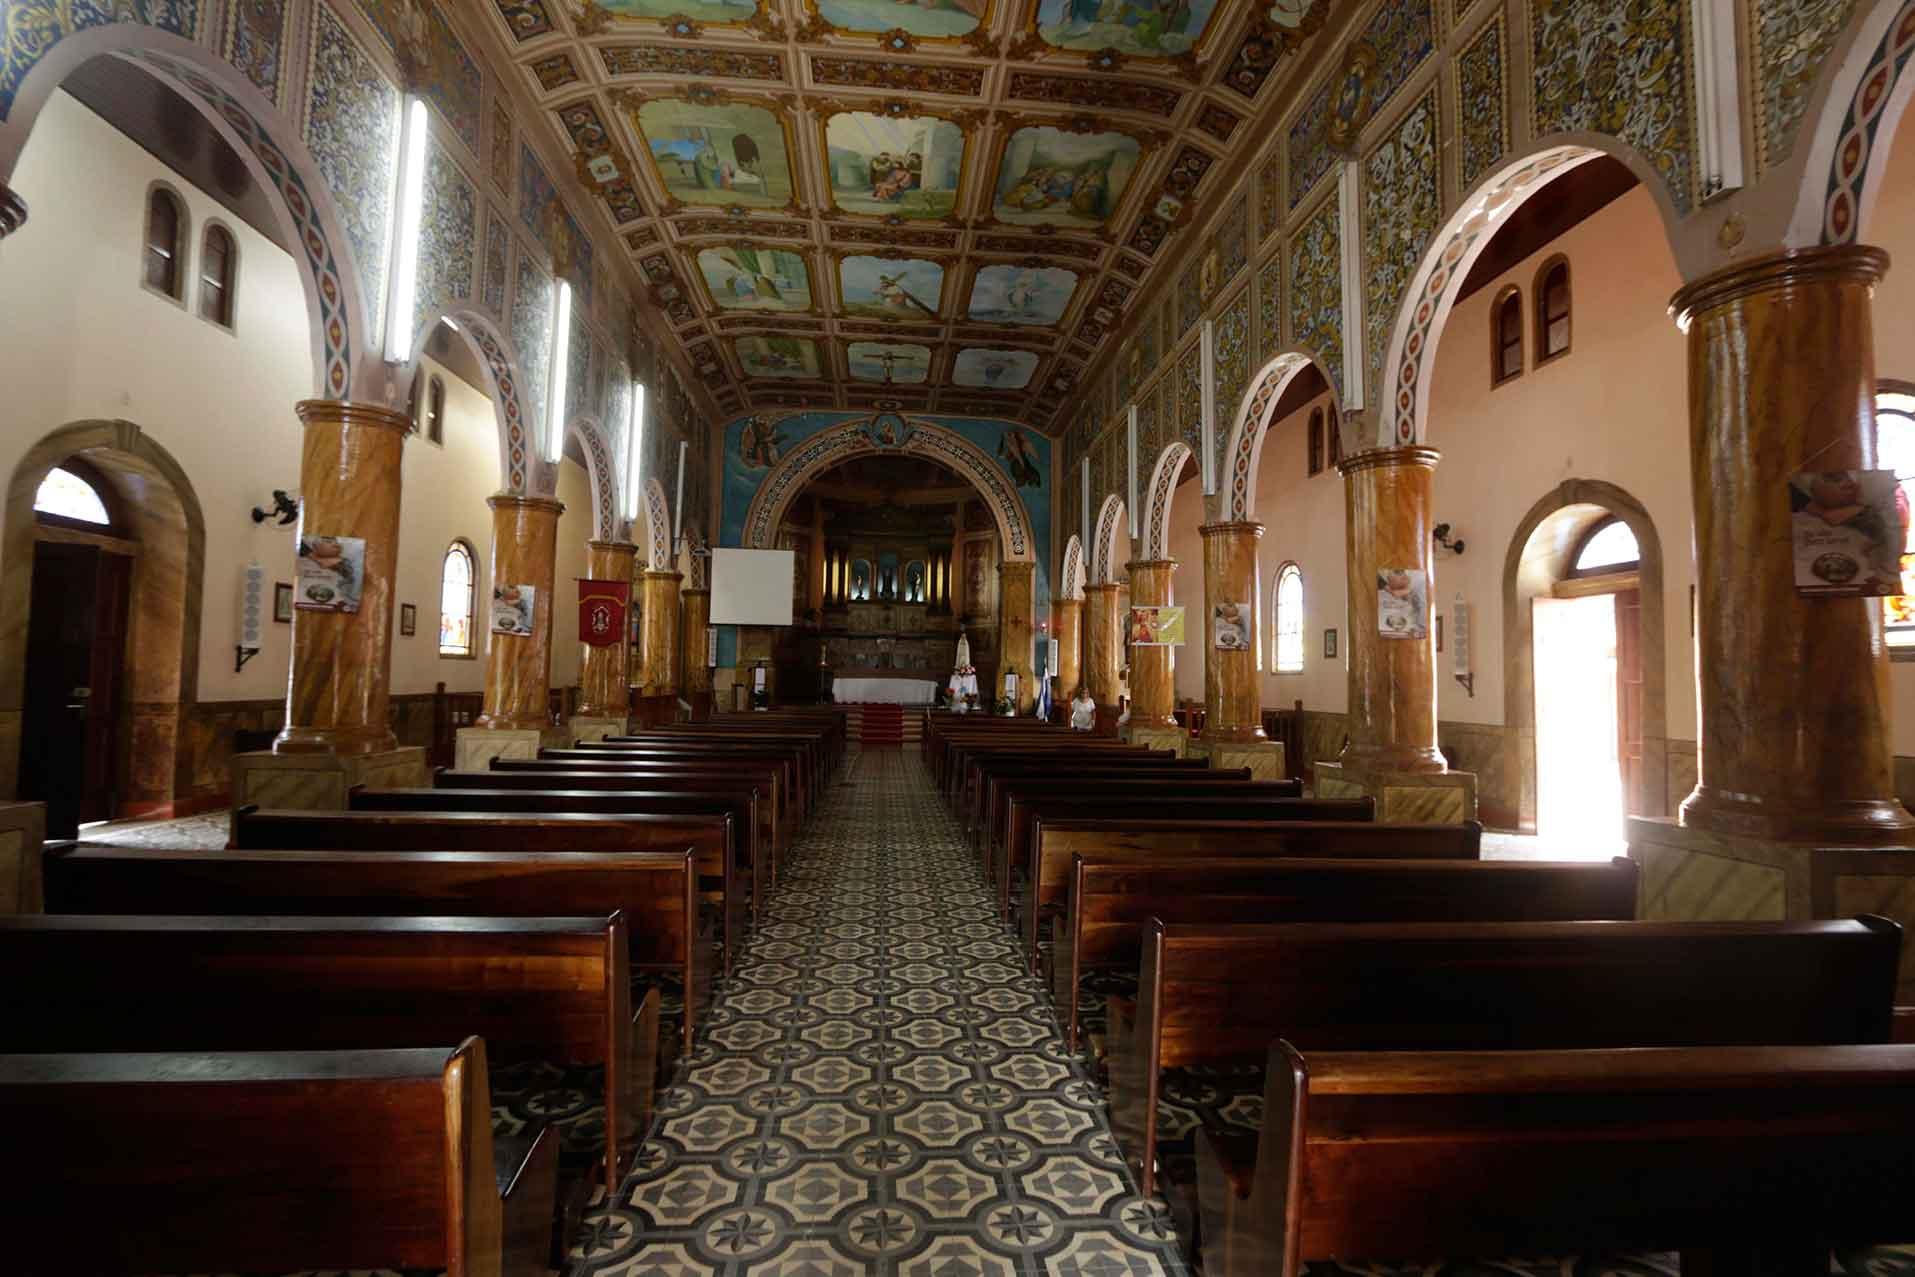 Igreja Matriz Nossa Senhora do Bonsucesso em Monteiro Lobato-Turismo-Religioso-Igreja-Matriz-_MG_5691-bx